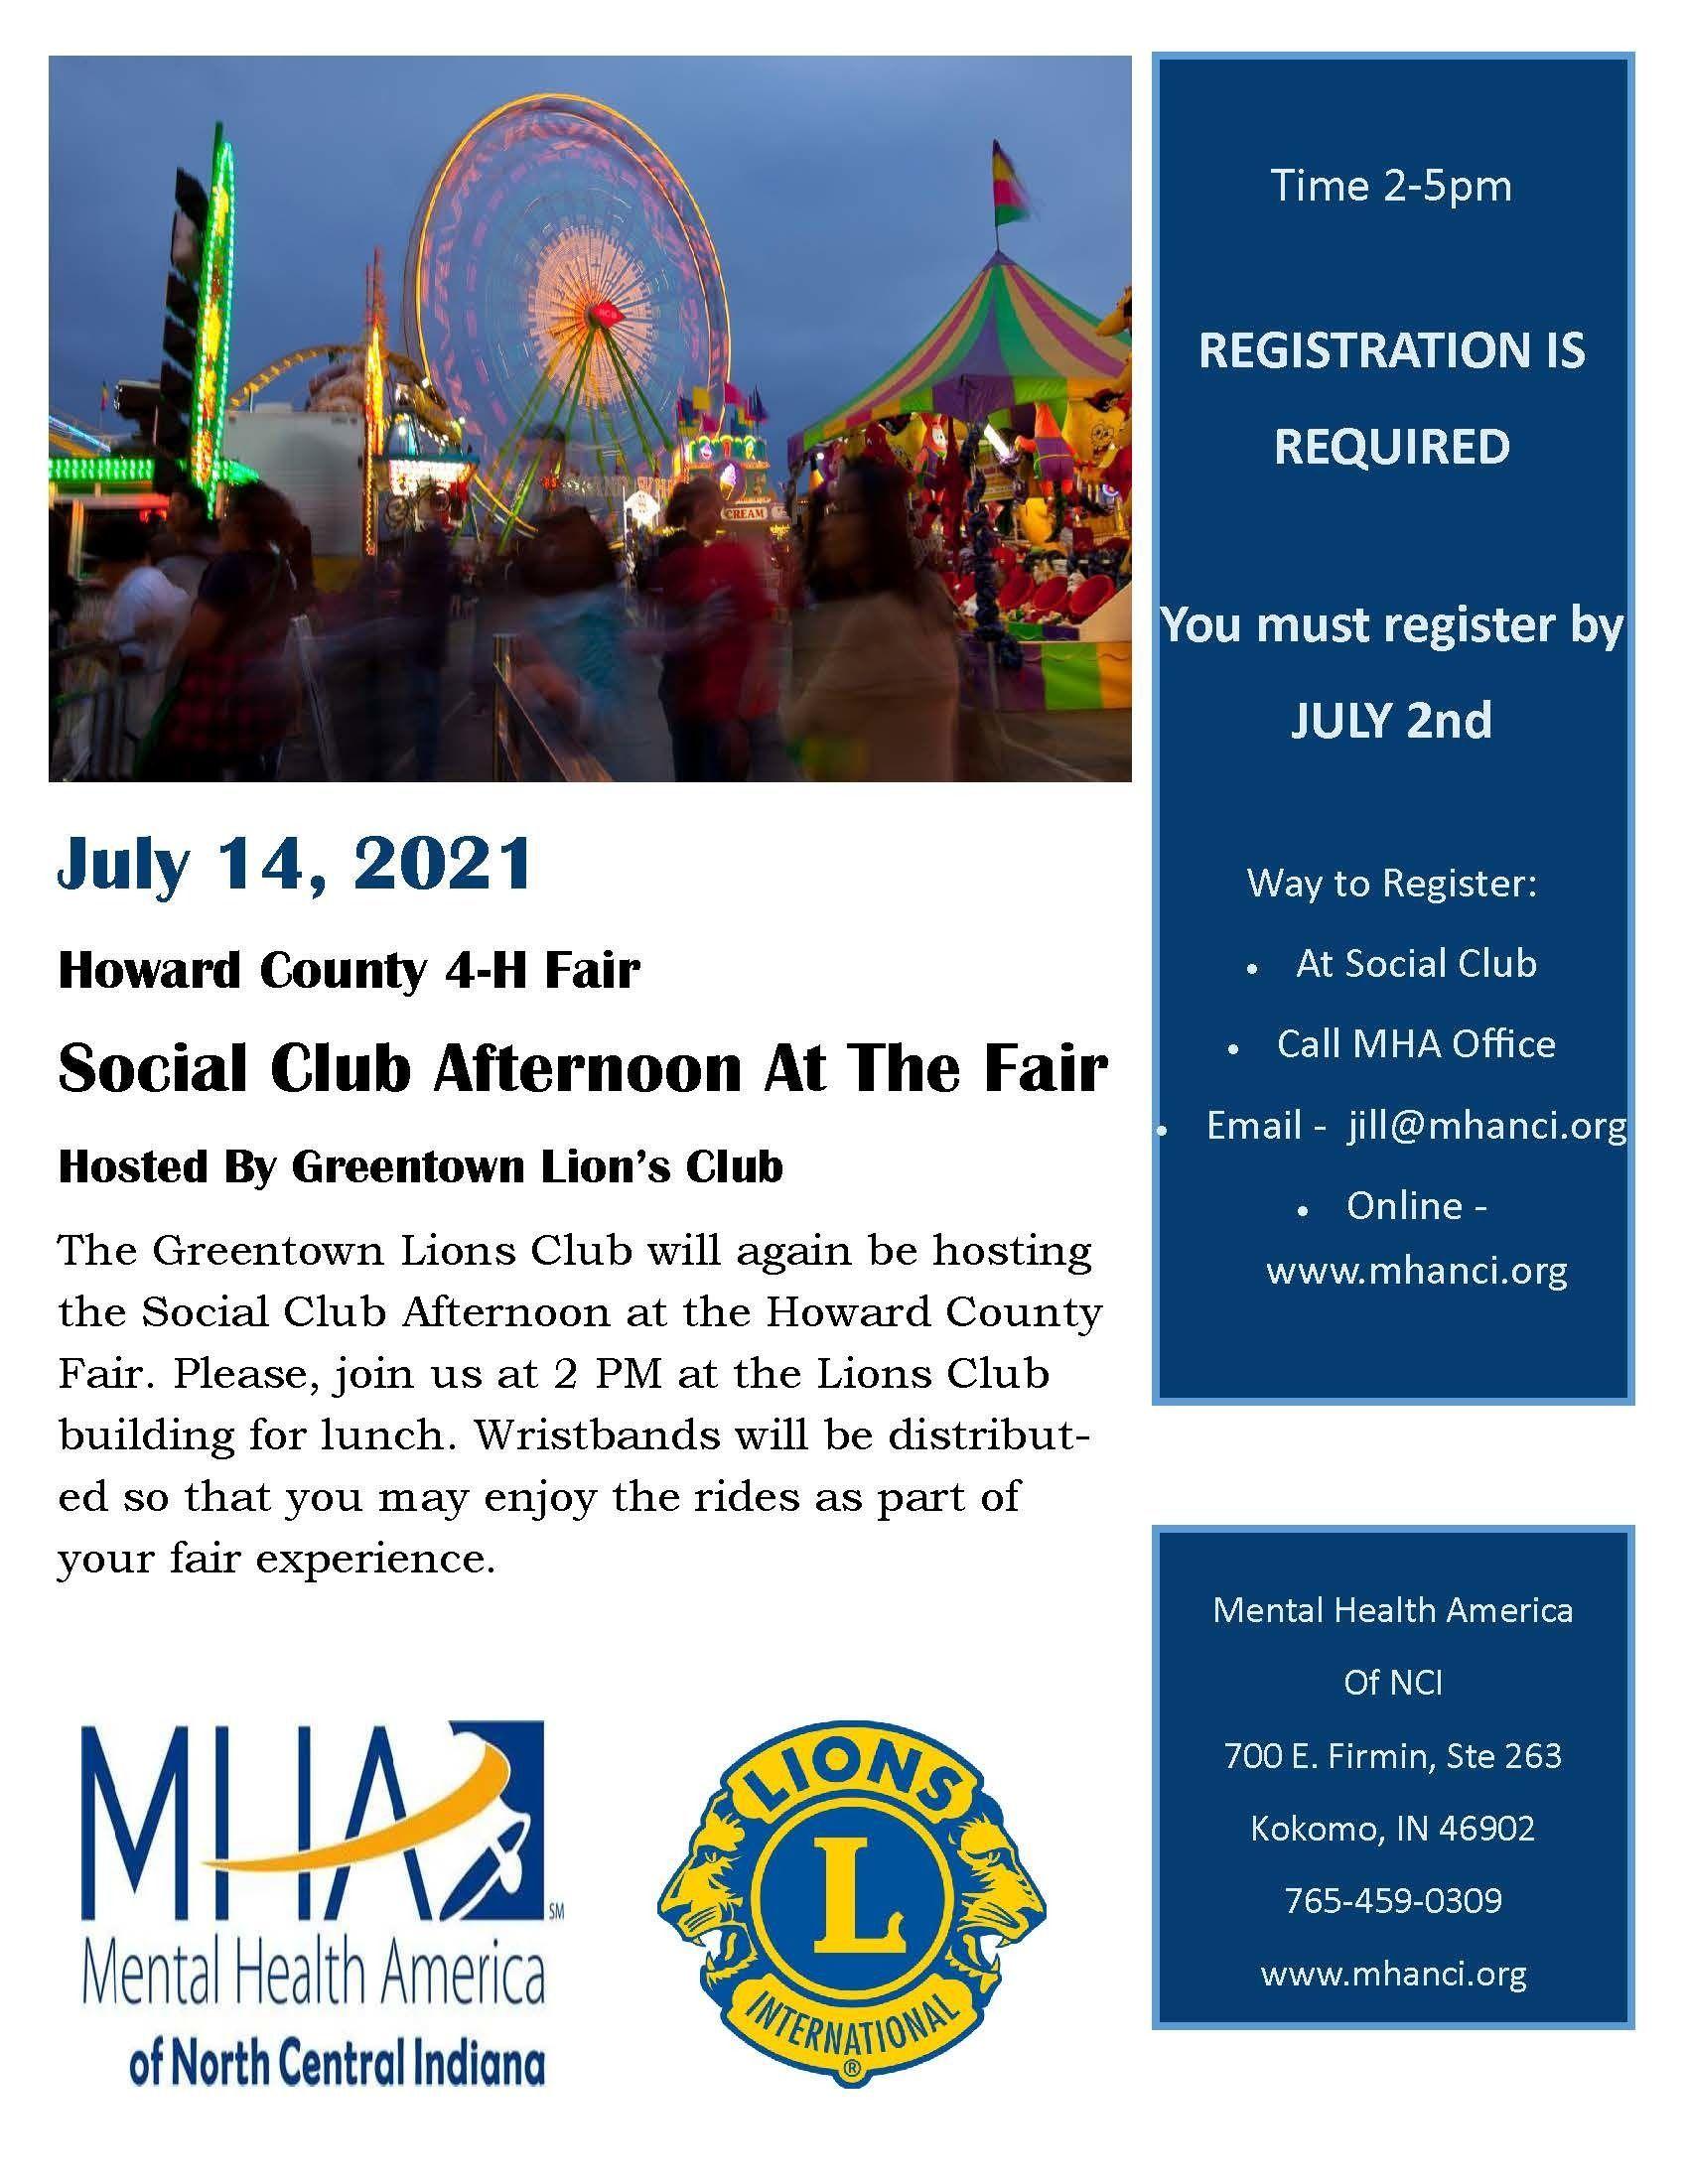 Social Club - Afternoon at the Fair